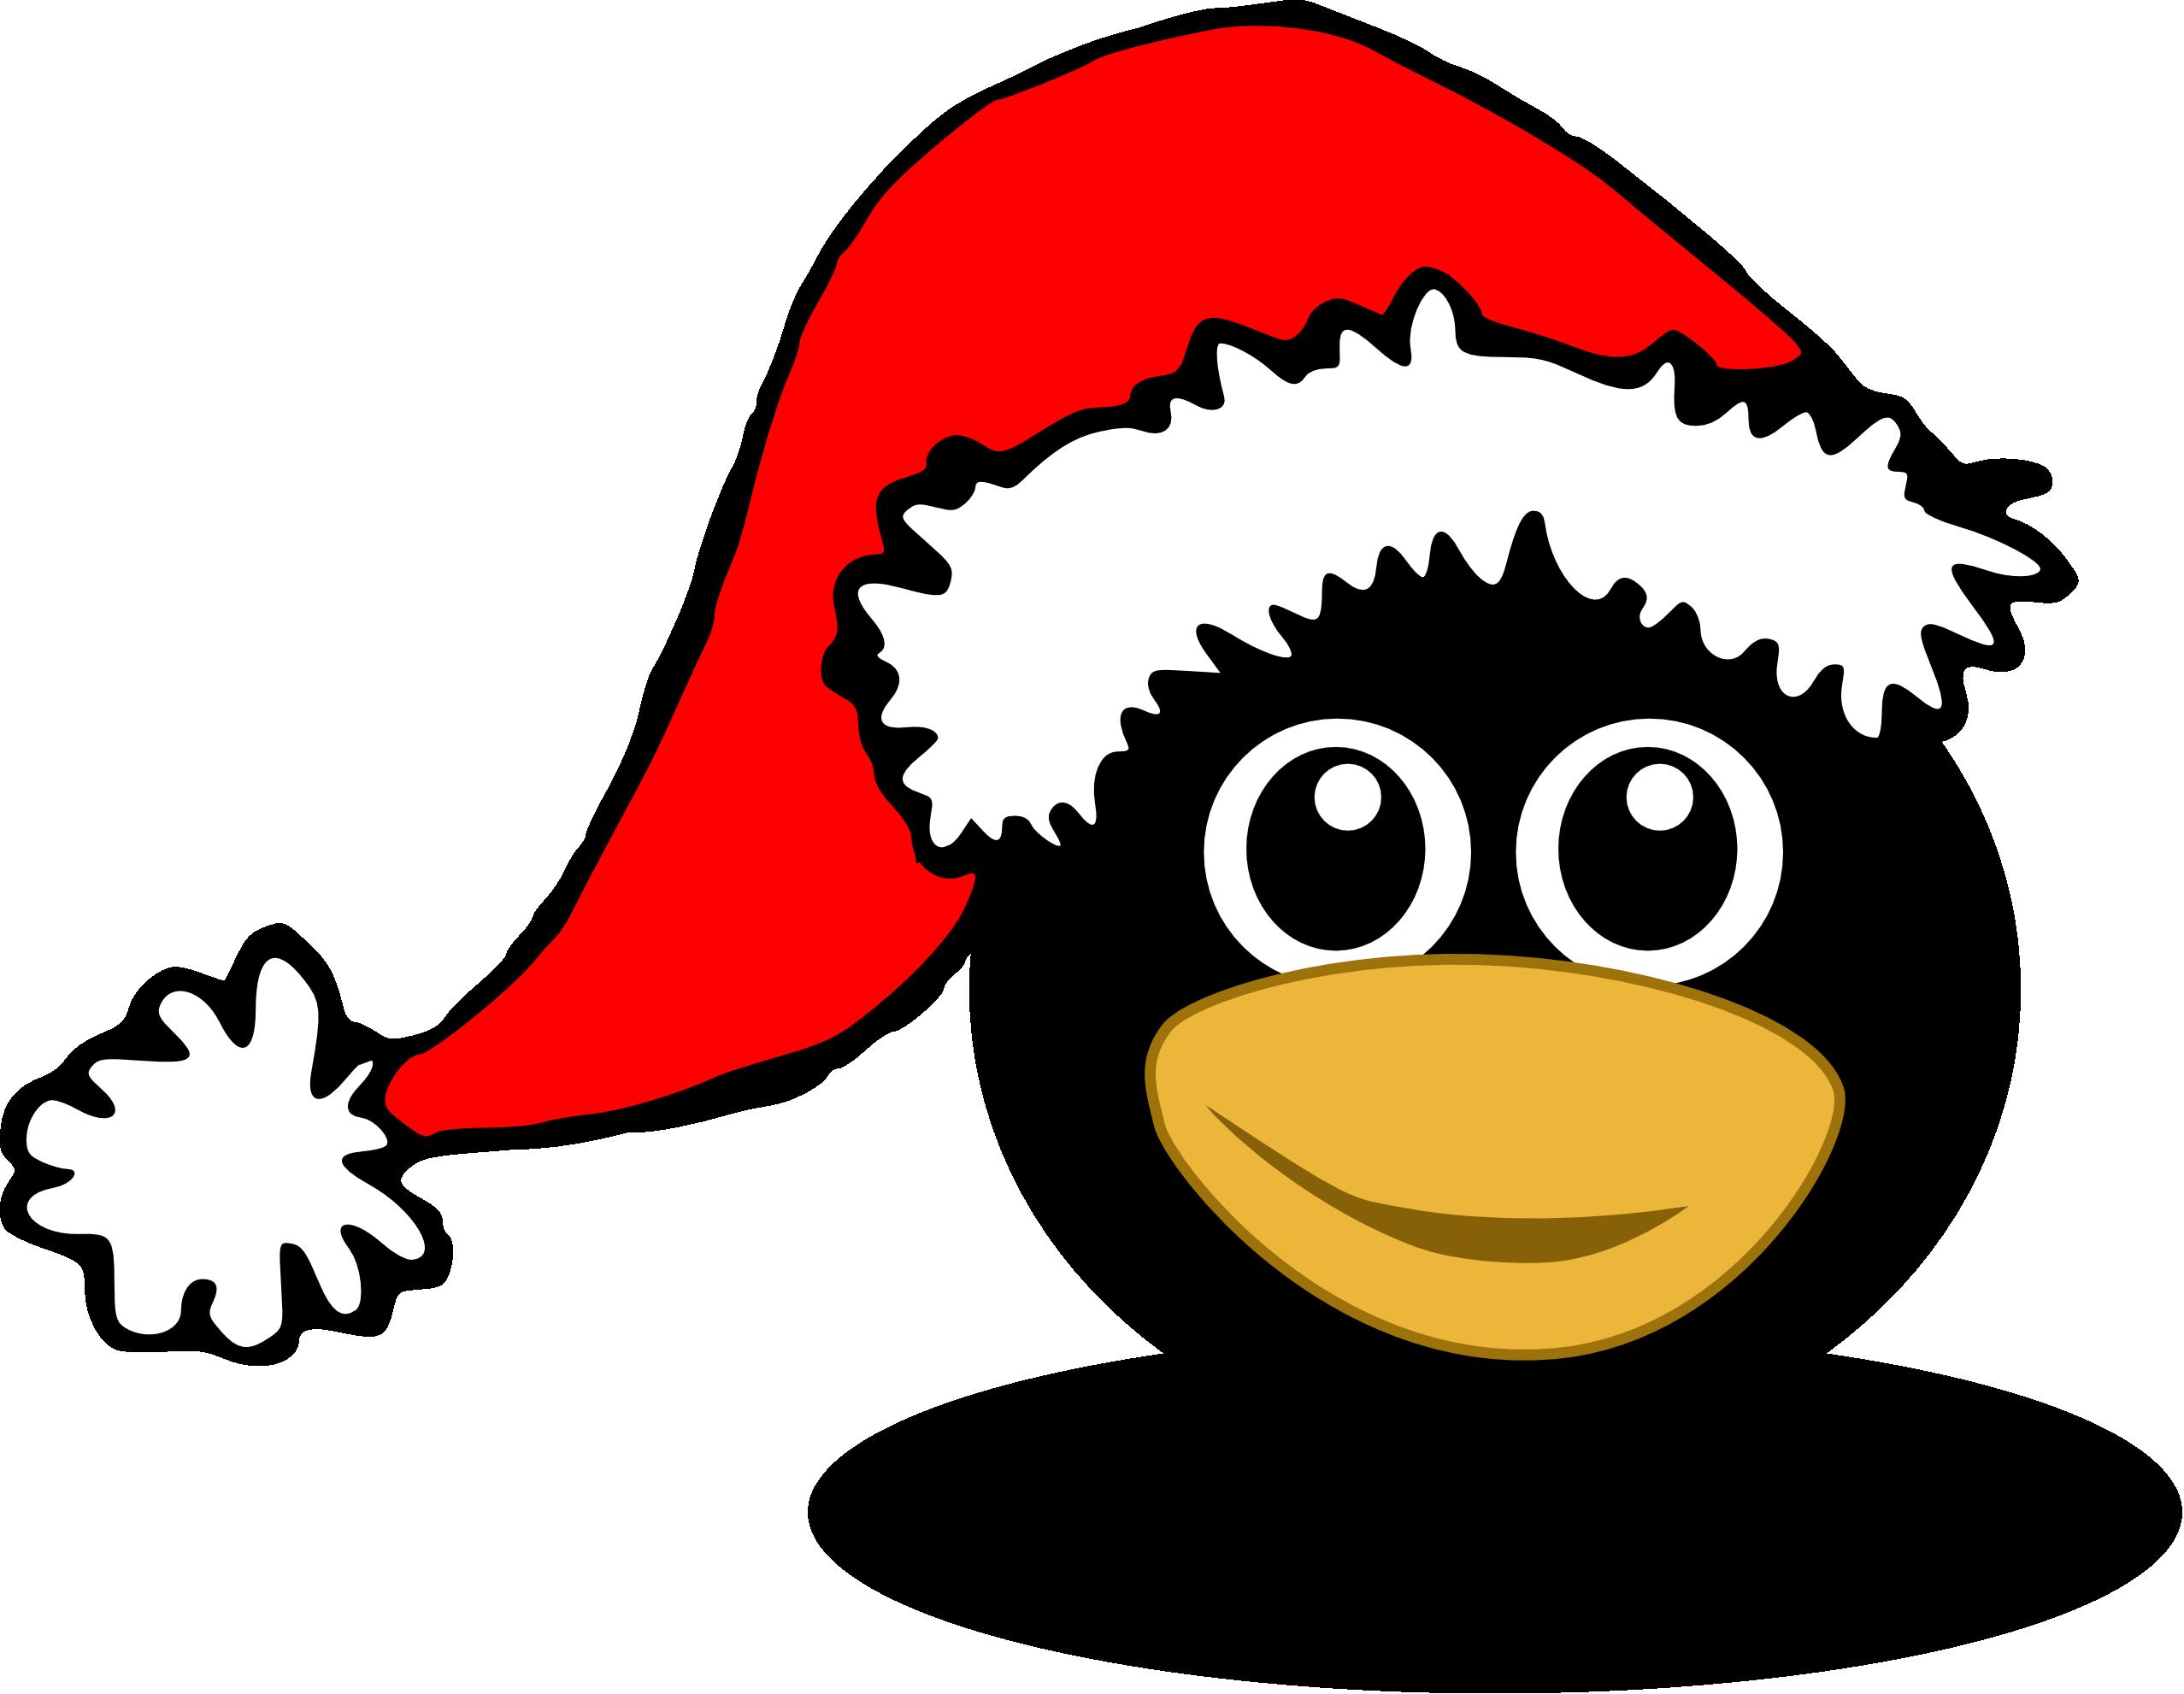 Sunglasses clipart santa. Penguin panda free images